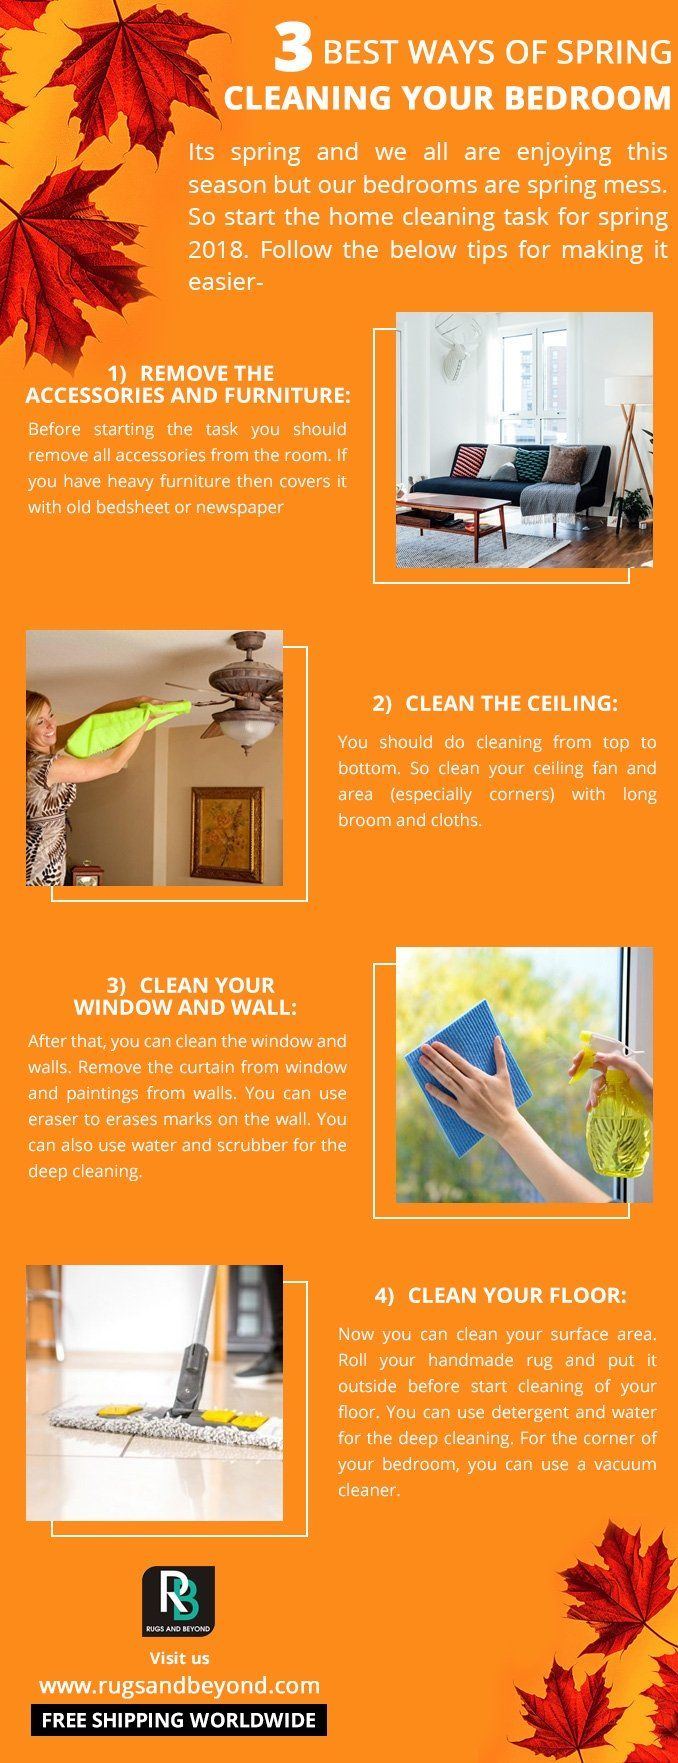 3 Best Ways of Spring Cleaning your Bedroom .#rugsandbeyond #rugsnotdrugs #design #tuesday #shopnow #colorful #designerrugs #bestrugsonline #livingroomgoals #madeinindia #maisondobjet #bloggers #bluerug #coupon #discount #modernrugs #contemporaryrugs #hpmkt #handmade #hallway #interiorlove #interiorinspo #interiordesign #inspiration #interiors #homedecoration #homedecor #process #womenentrepreneurs #sakshitalwar #womeninbusiness #shopnow